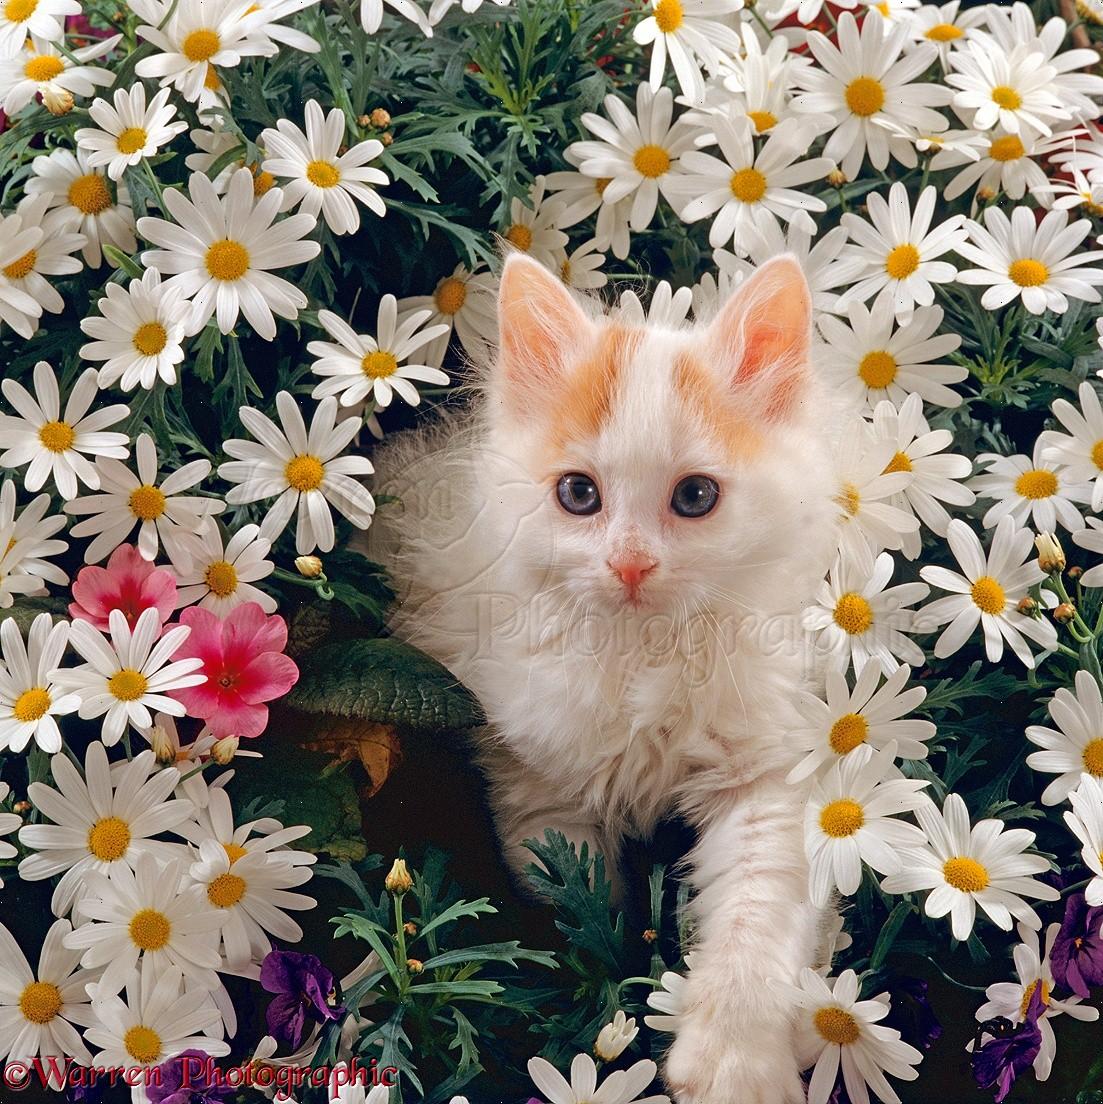 Turkish Van kitten among white daisies with pink primulas